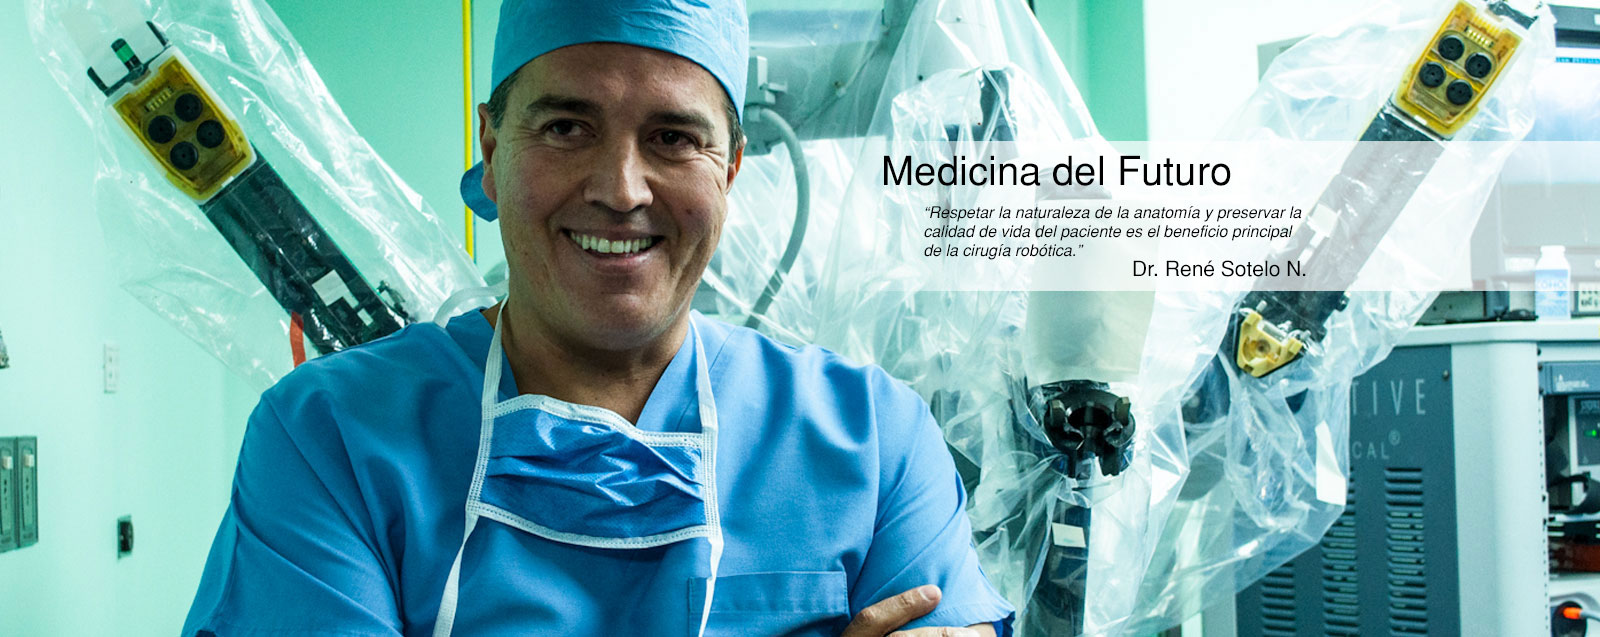 S01-rene-sotelo-urologo-011-nuevo